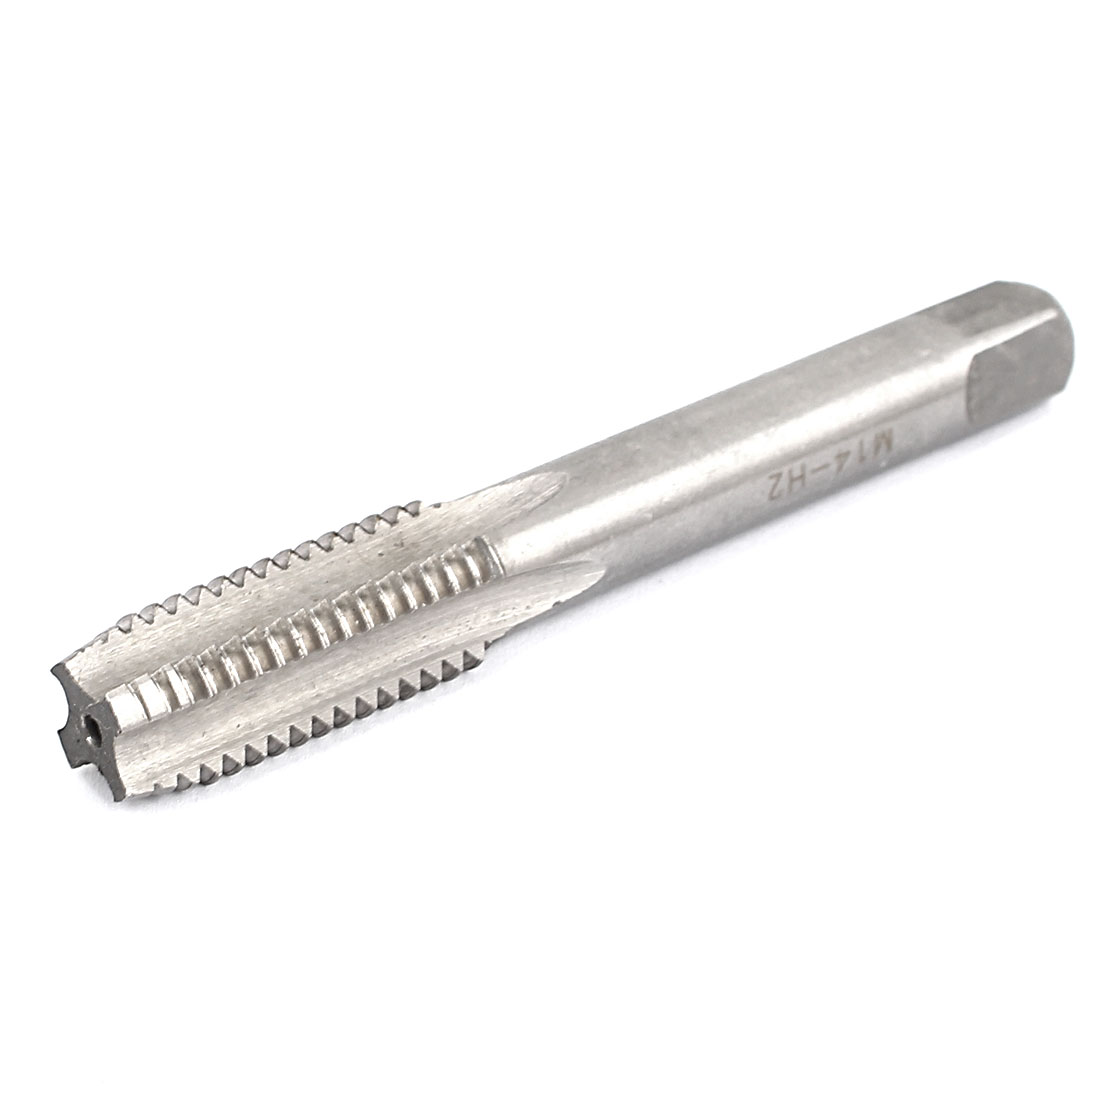 M14 14mm Cutting Dia 4 Flutes HSS Round Shank Machine Screw Thread Tap 95mm Long